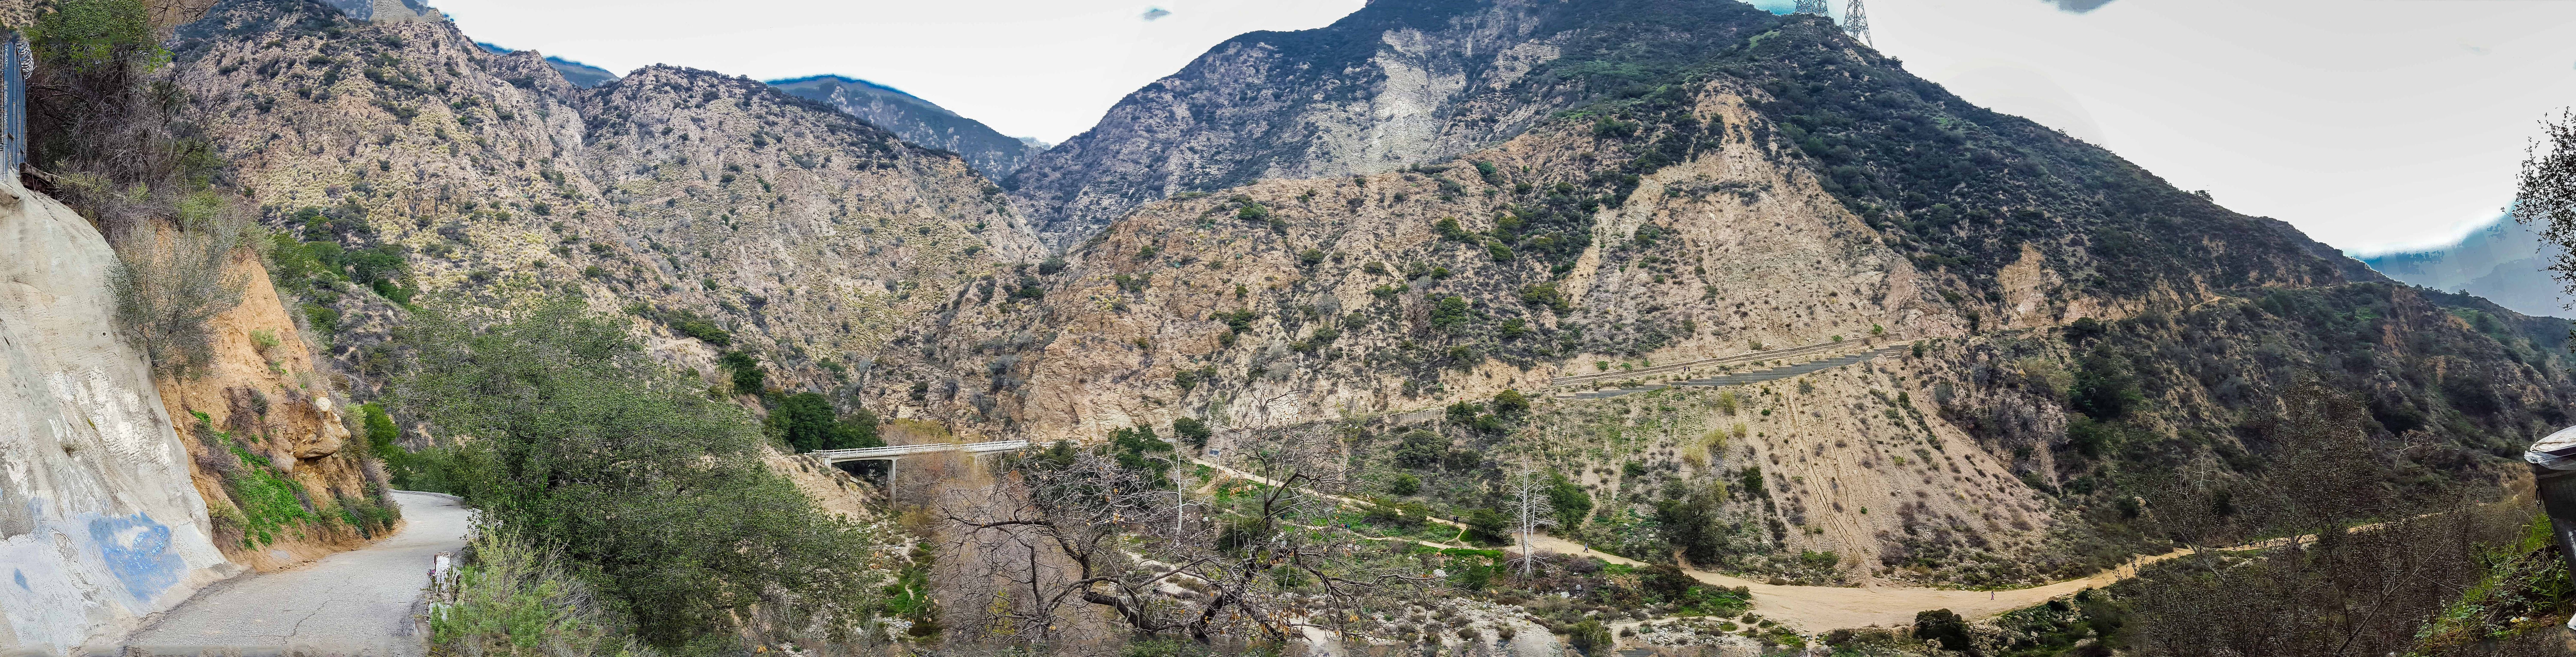 Eaton Canyon Natural Area County Park